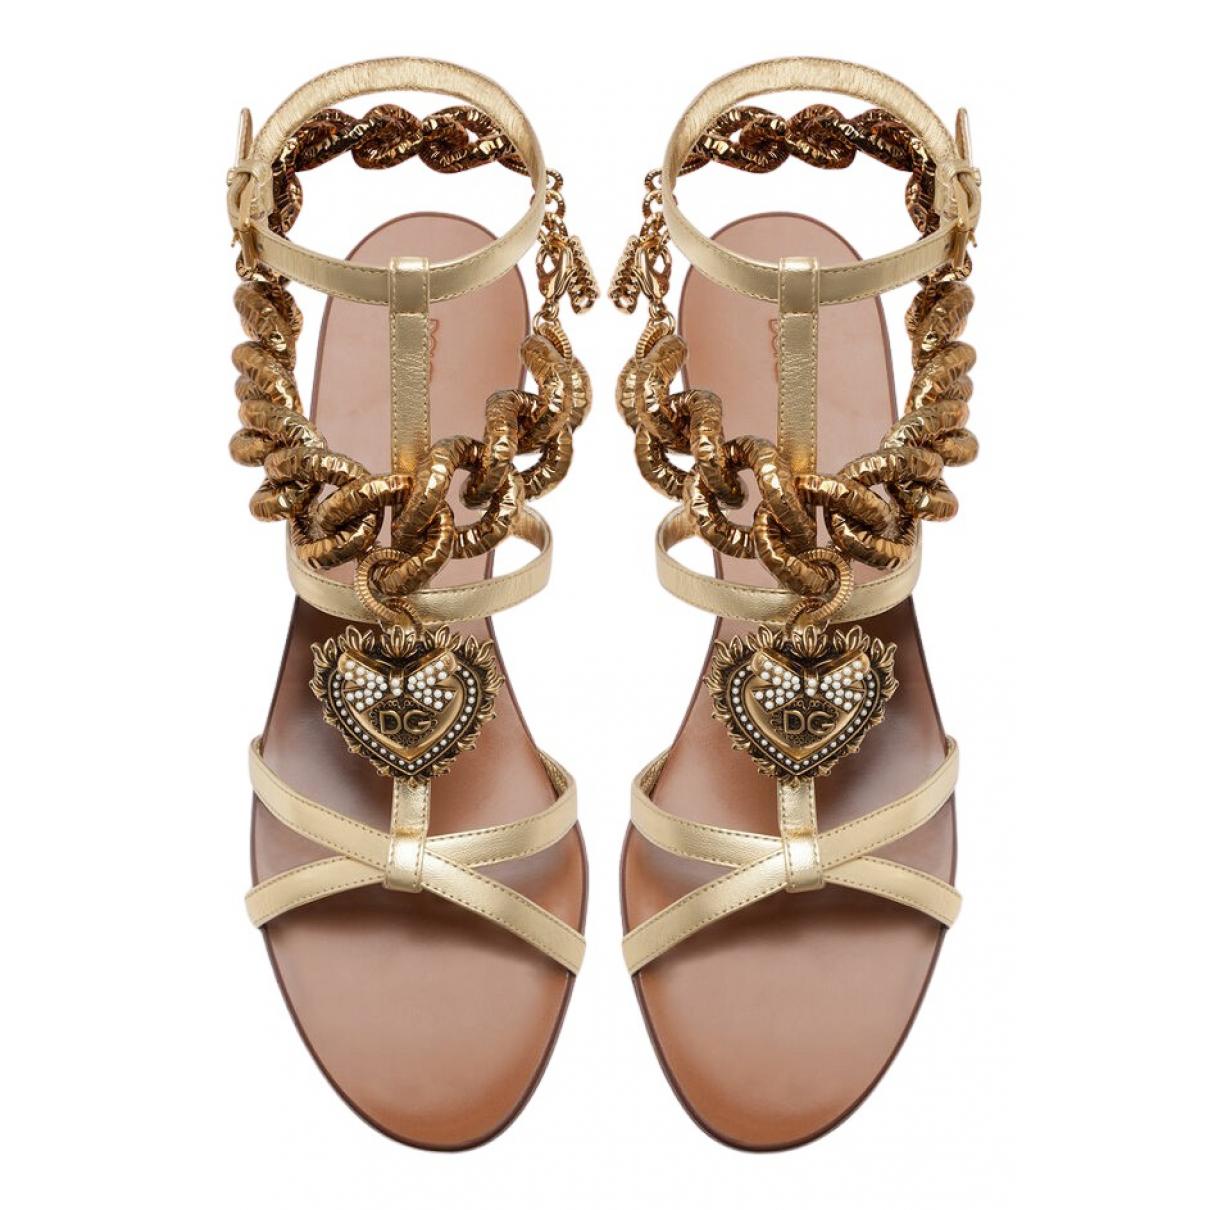 Dolce & Gabbana N Gold Leather Sandals for Women 37.5 EU